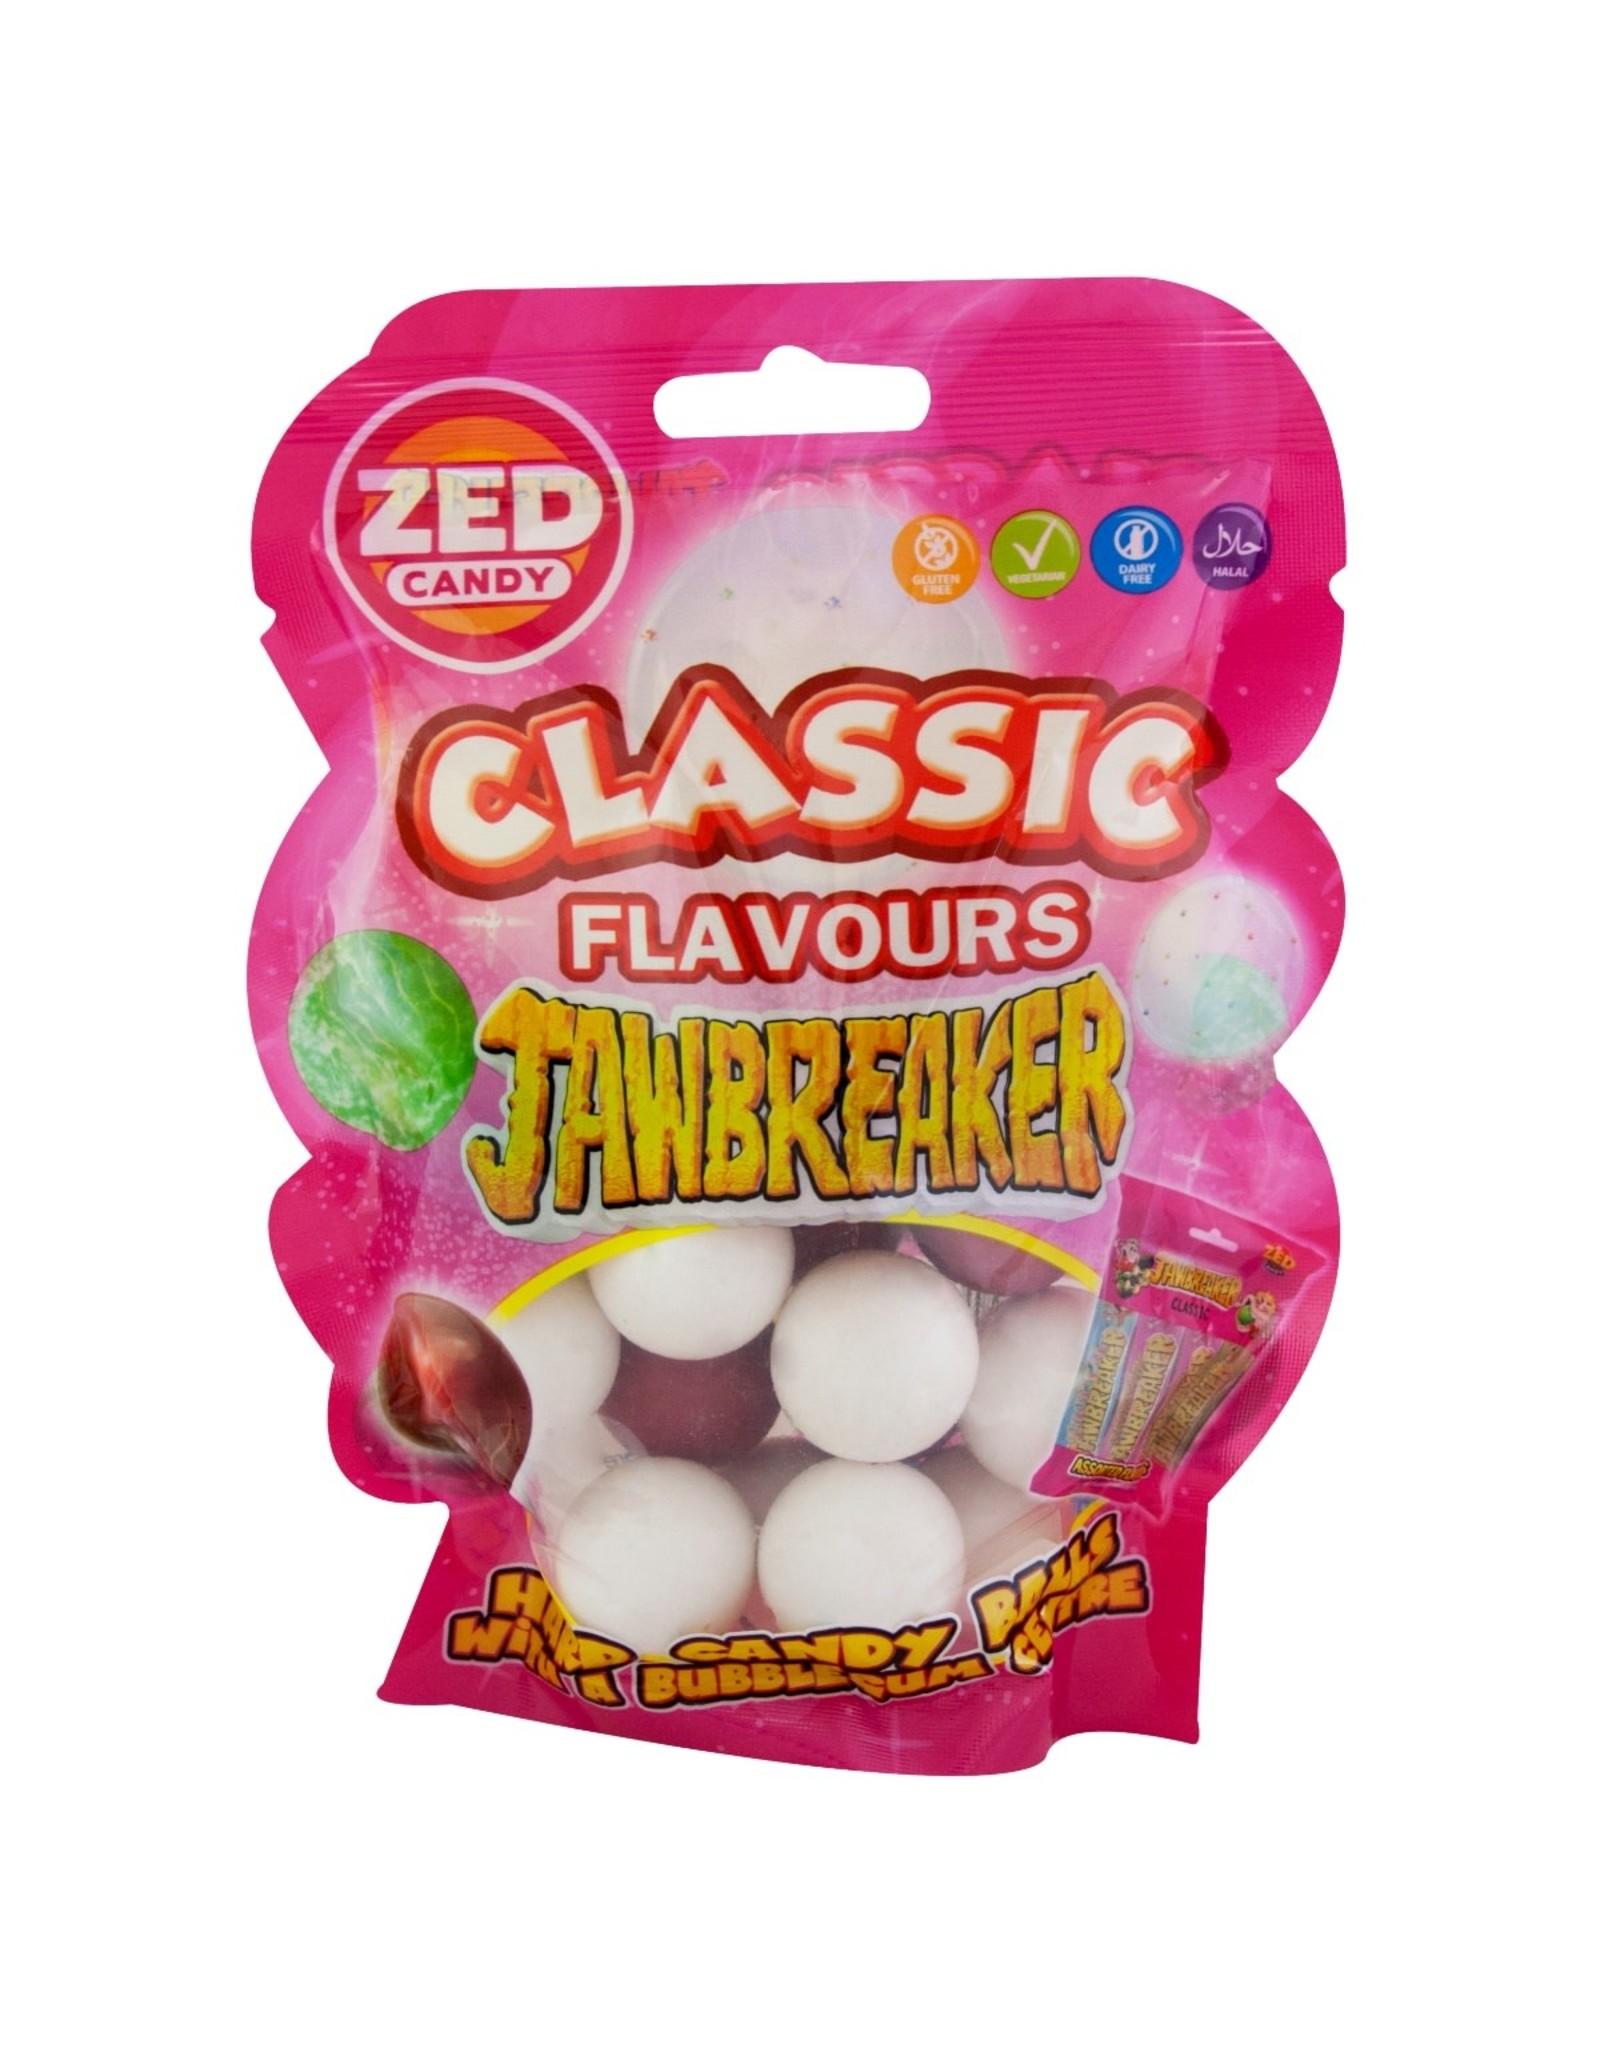 Zed Classic Jawbreaker - 132g